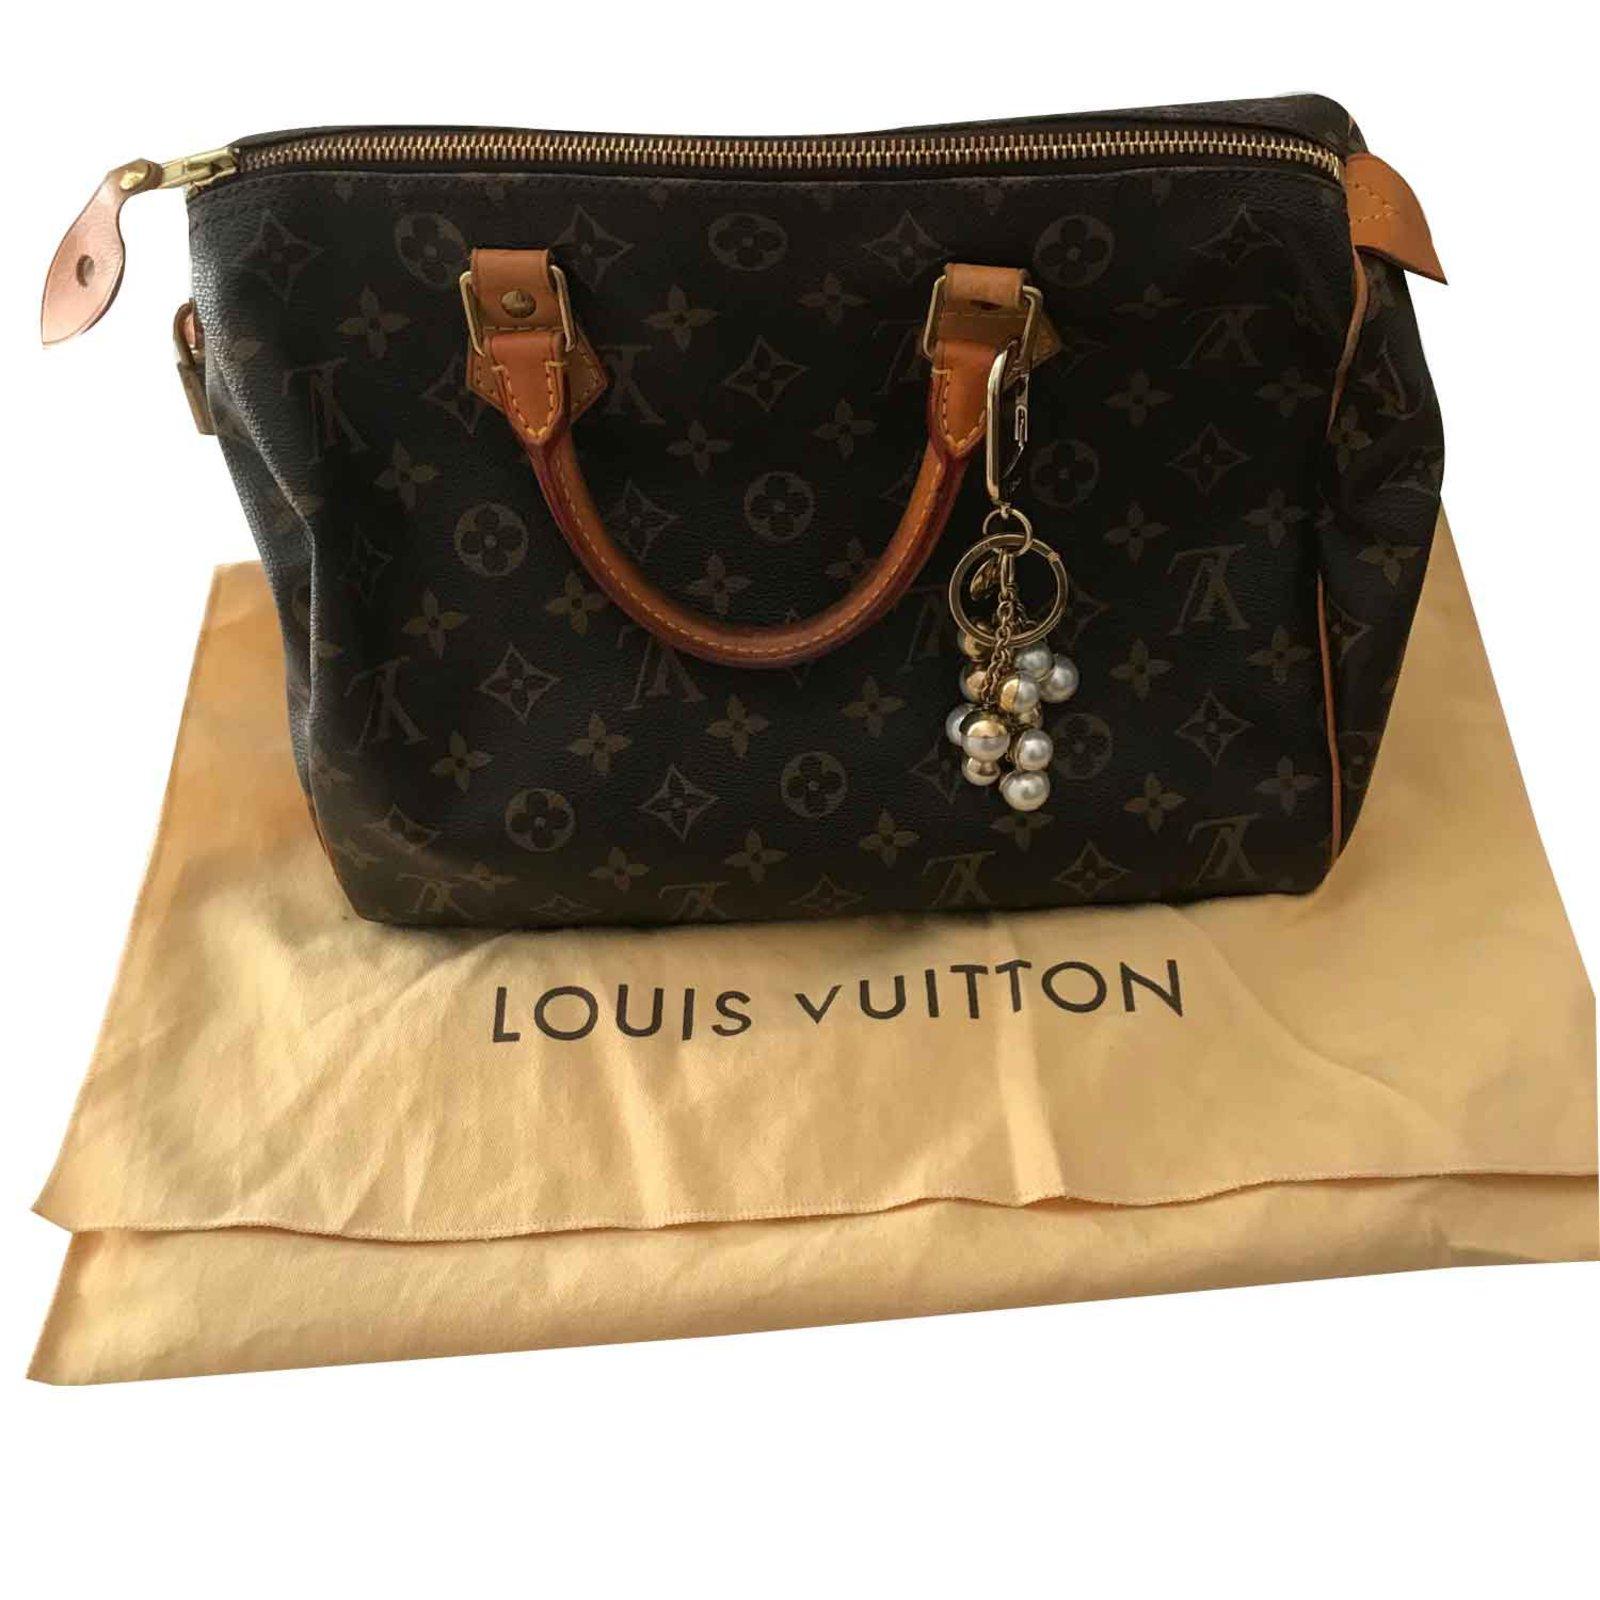 dfc1050215e0 Louis Vuitton Speedy 30 Handbags Leather Brown ref.103657 - Joli Closet